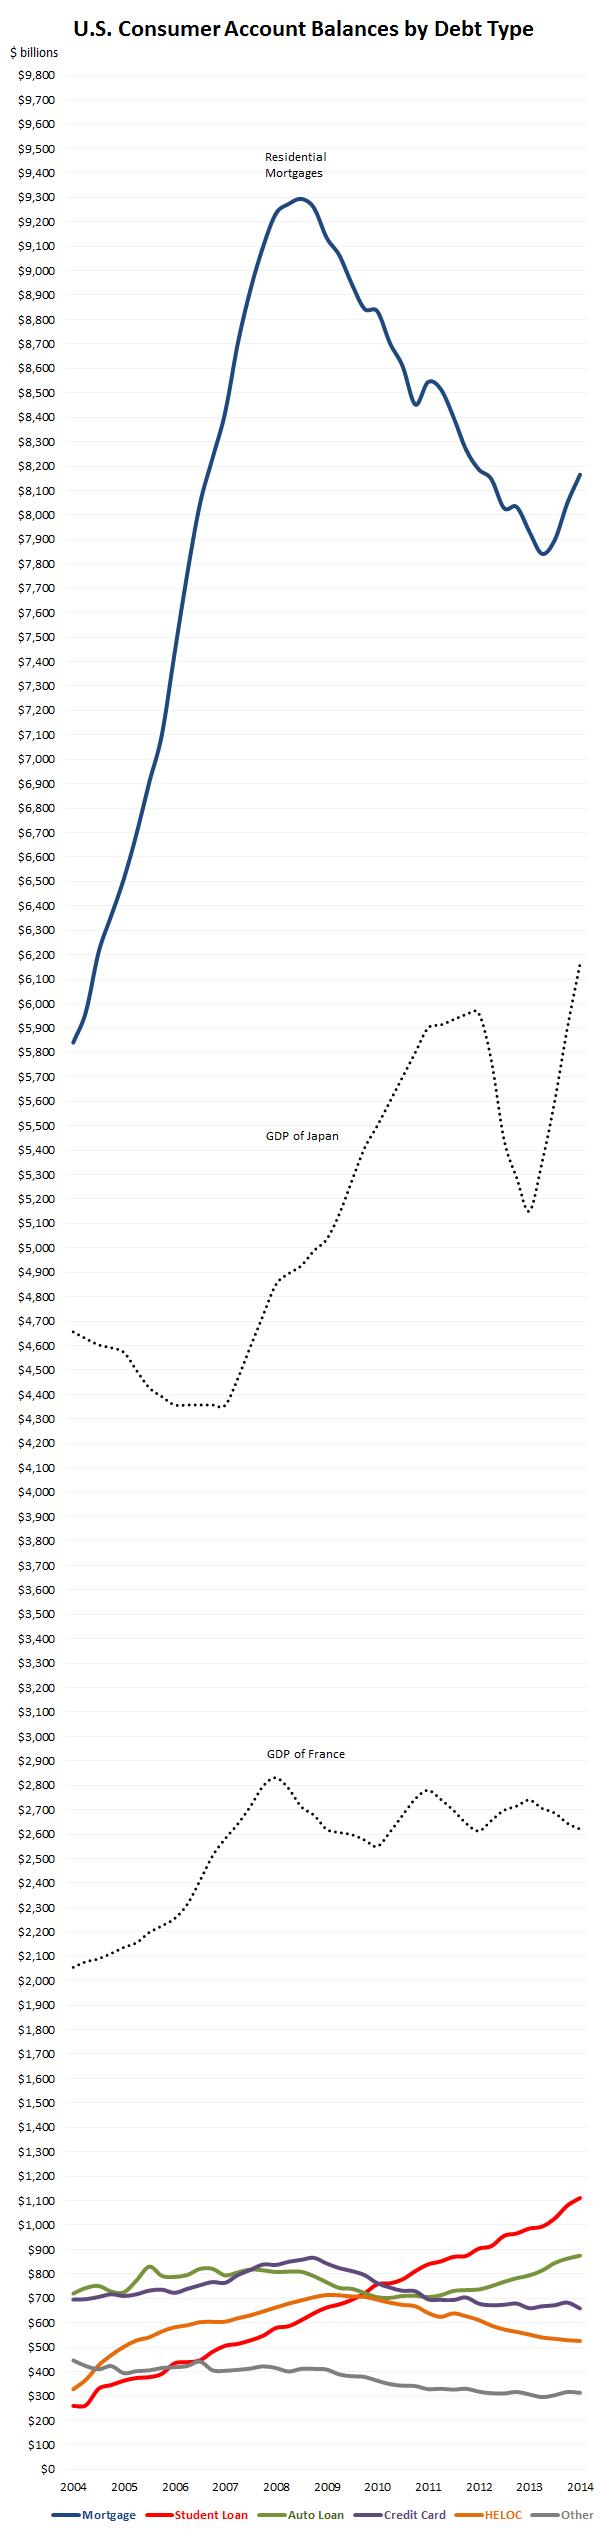 Debt types vs. GDP